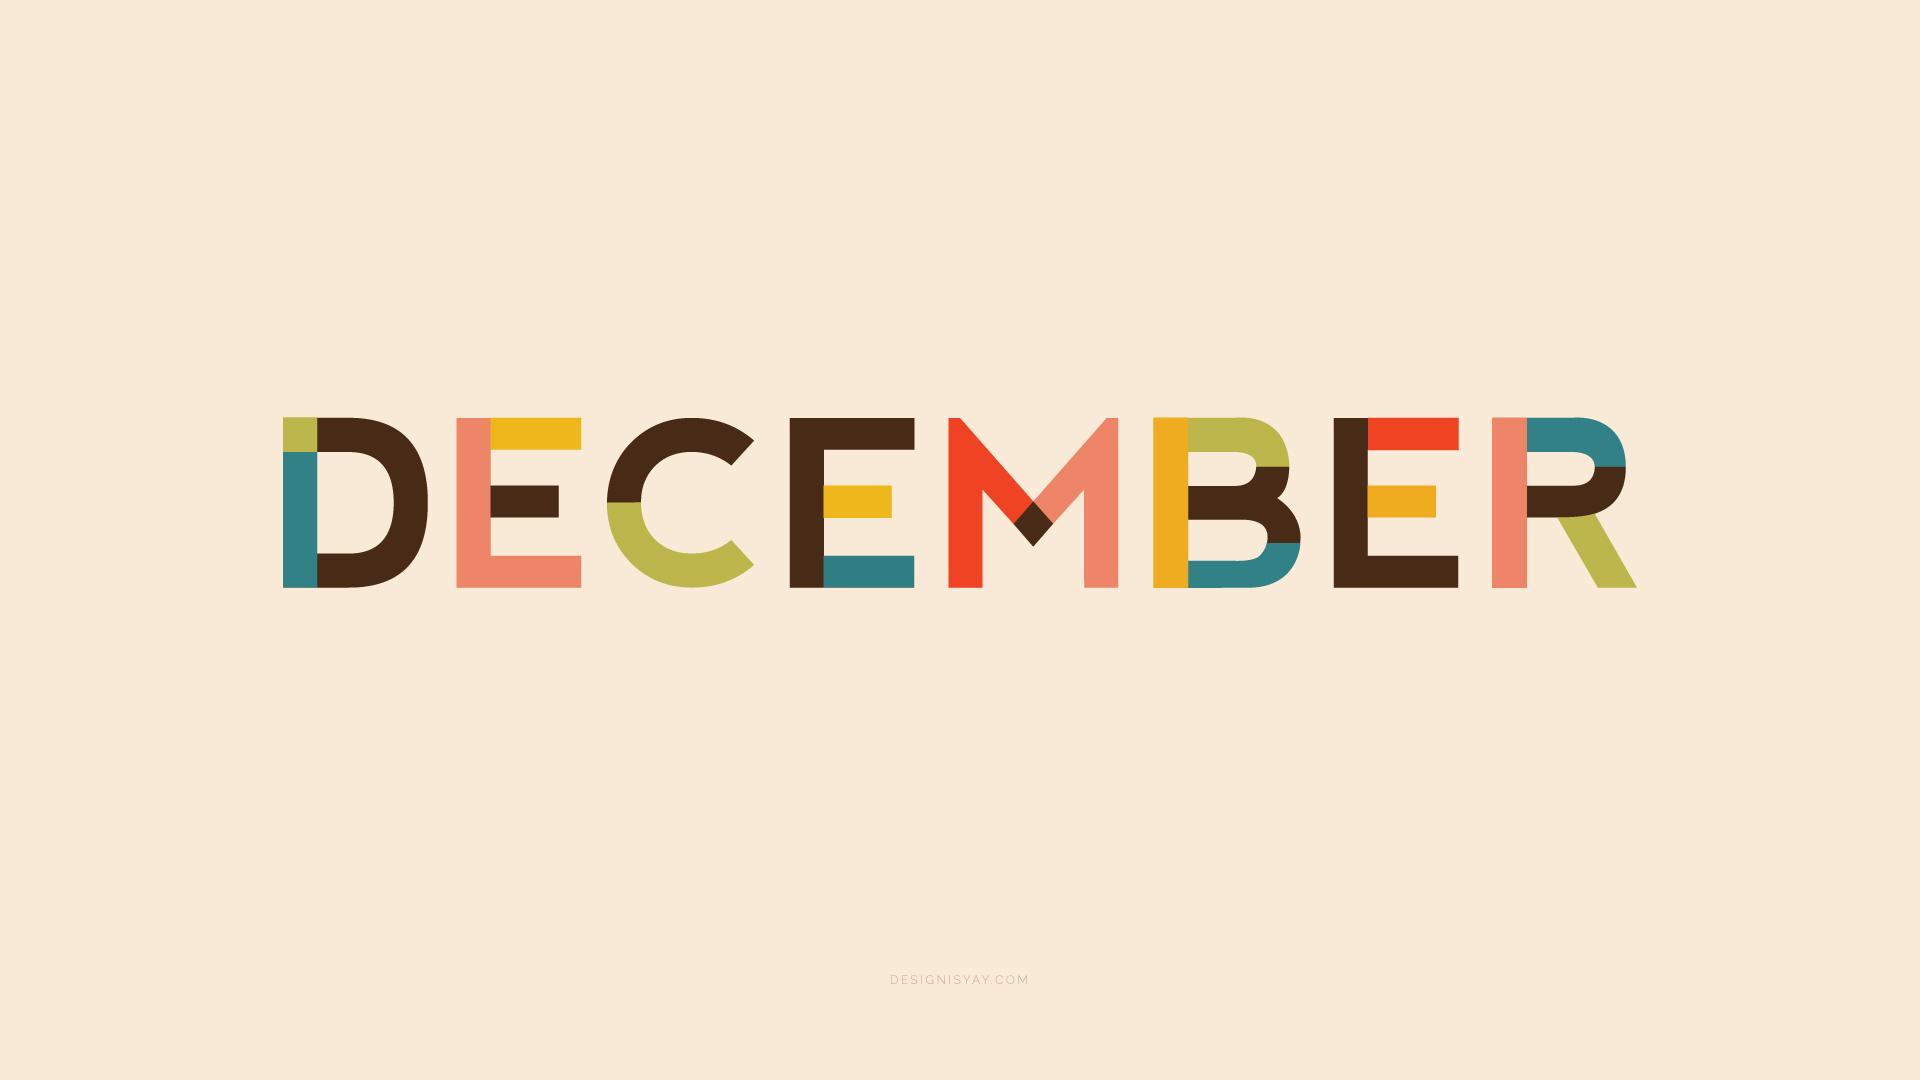 December-desktop-wallpaper-1920x1080